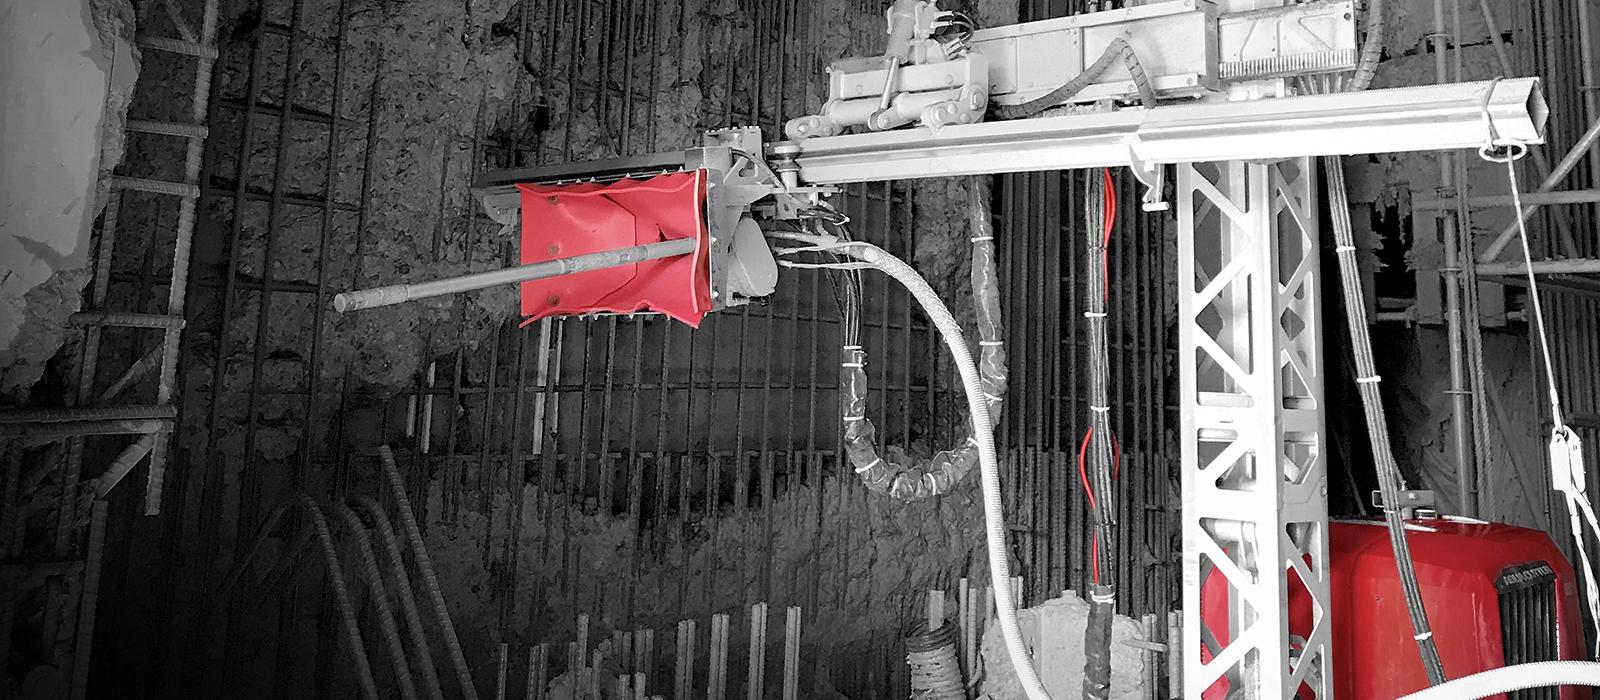 Aquajet on location jobreport customer hydrodemolition concrete repair aqua cutter ecoclear canada job project hydroelectric generating station operation